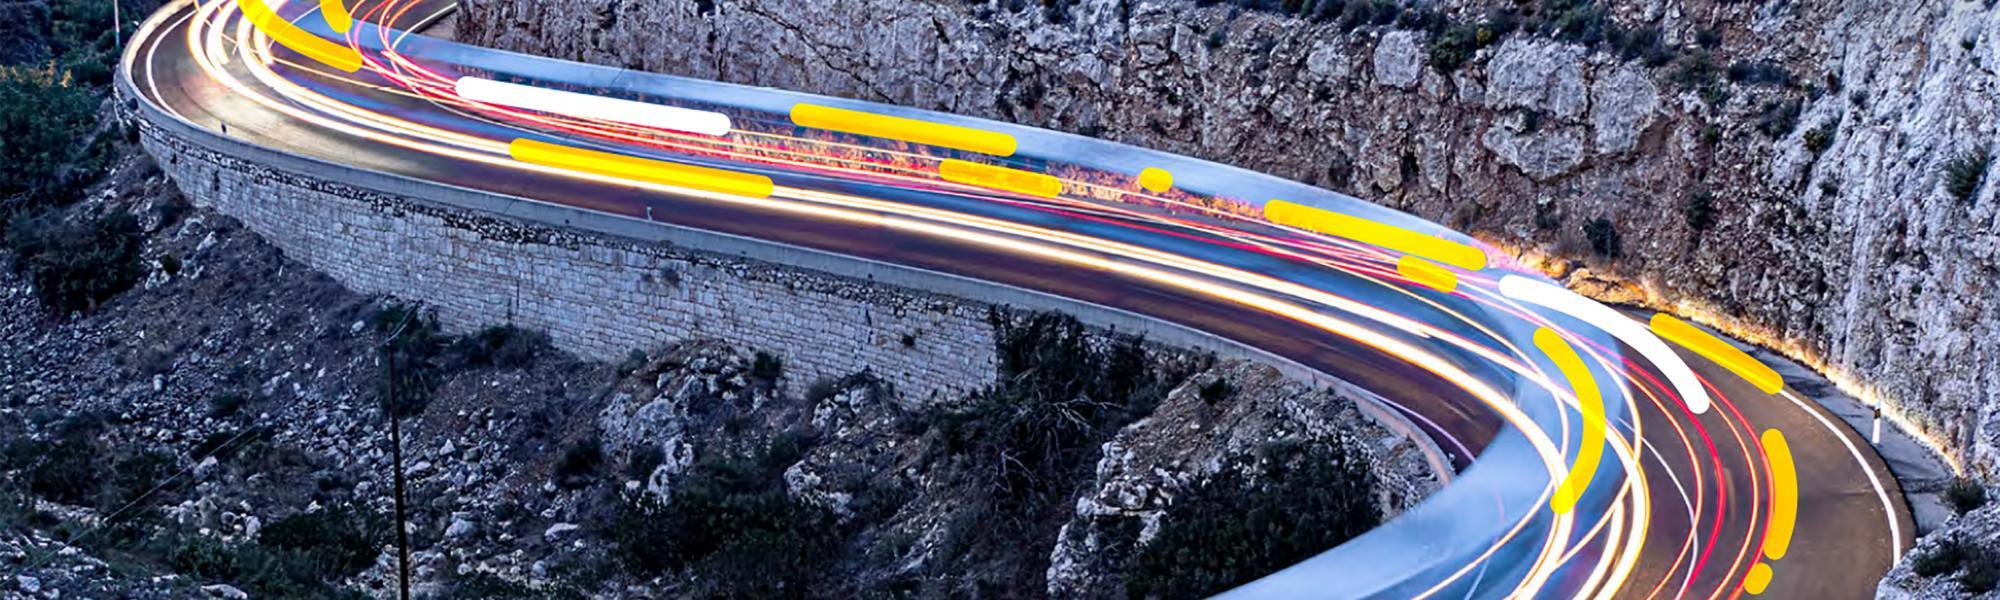 IRU | World Road Transport Organisation | IRU